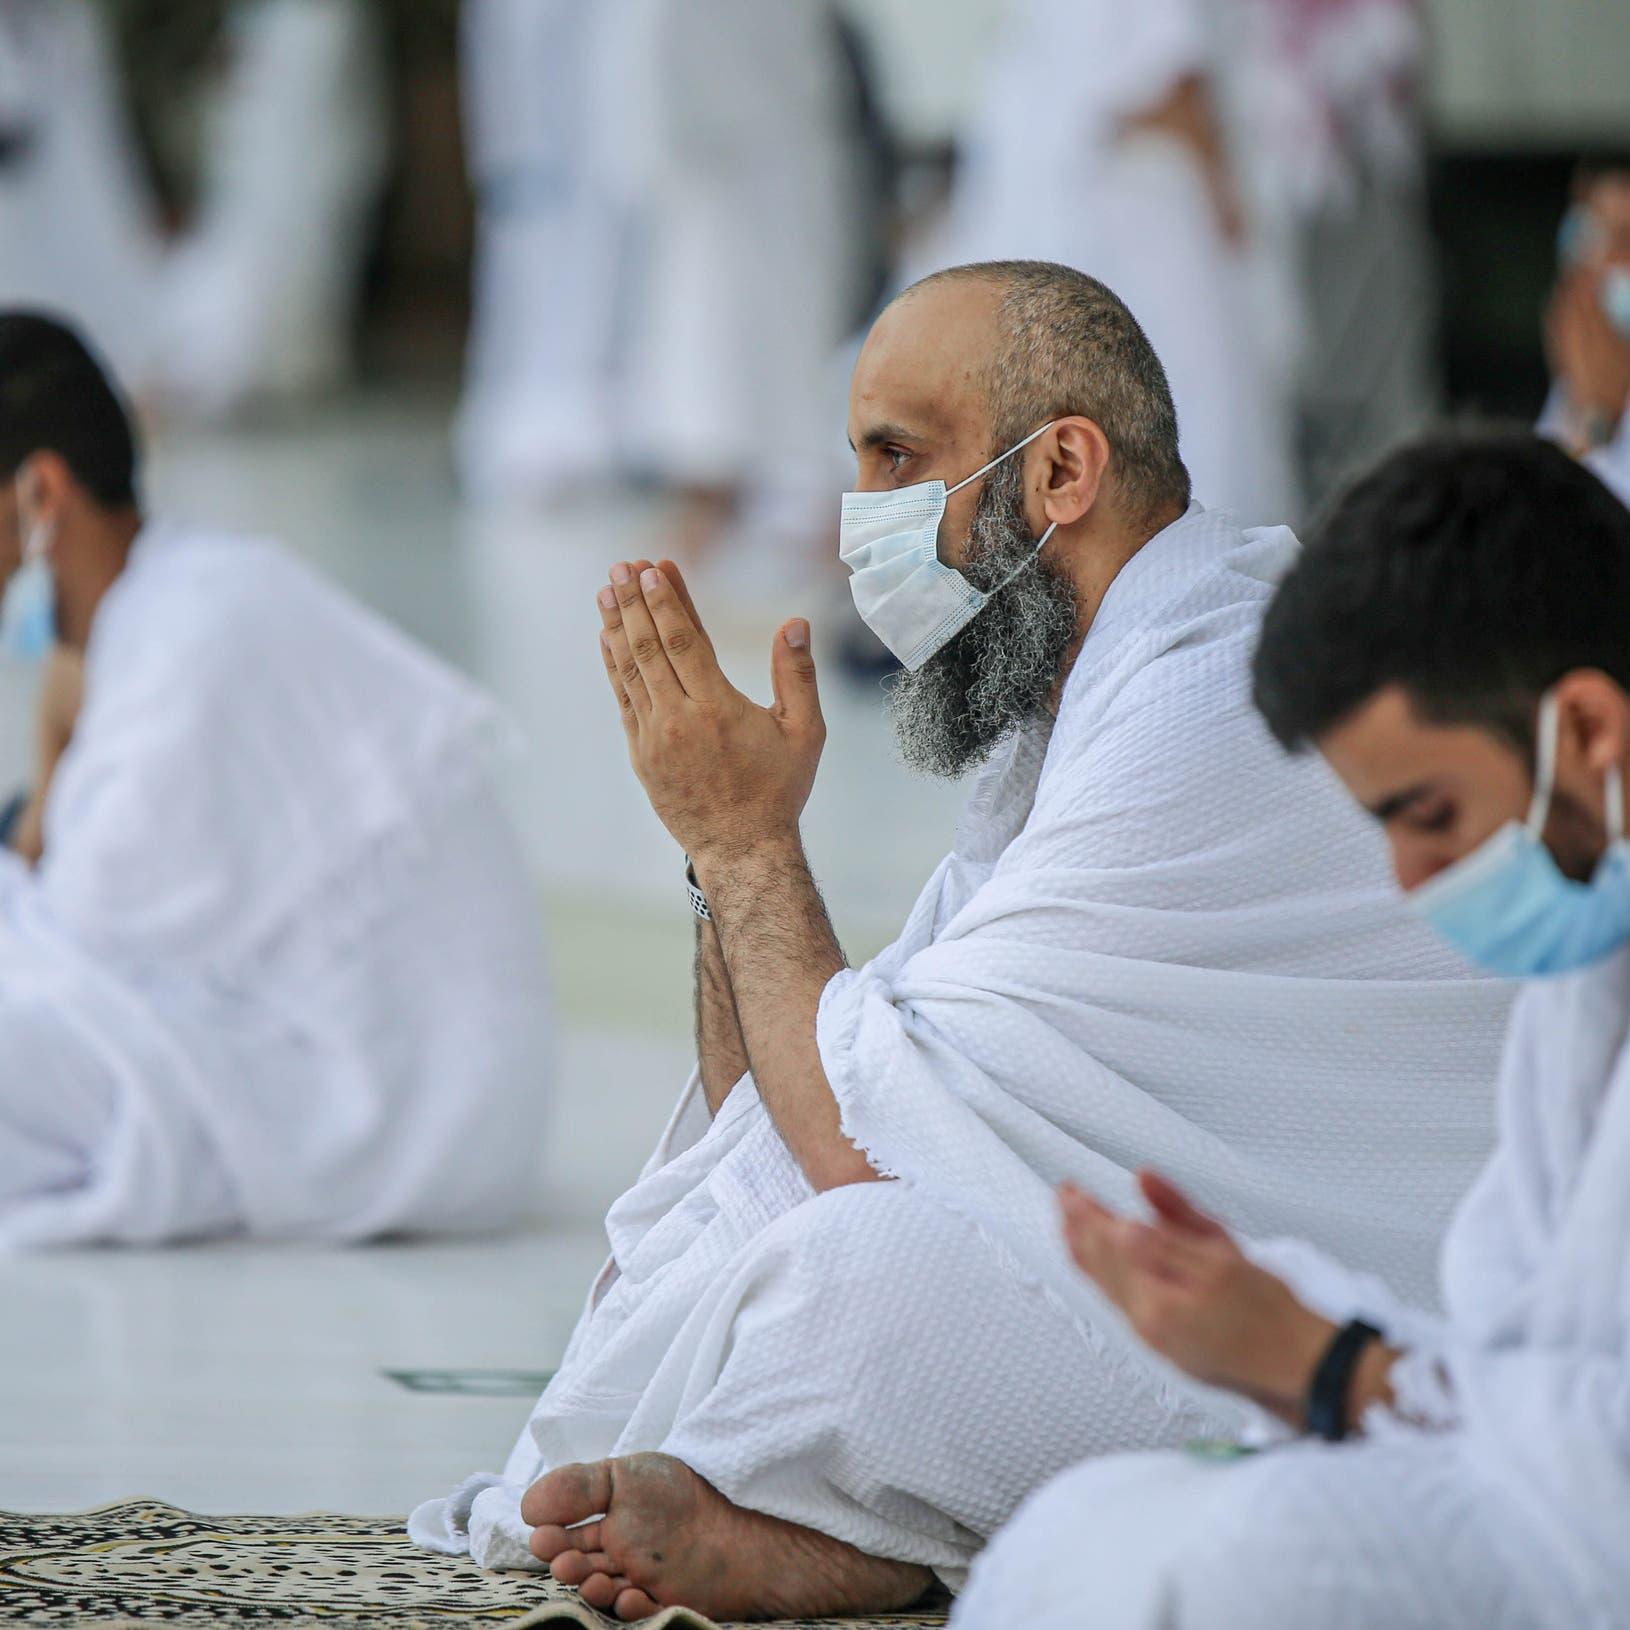 Saudi Arabia to welcome foreign Umrah pilgrims starting first of Muharram: Source